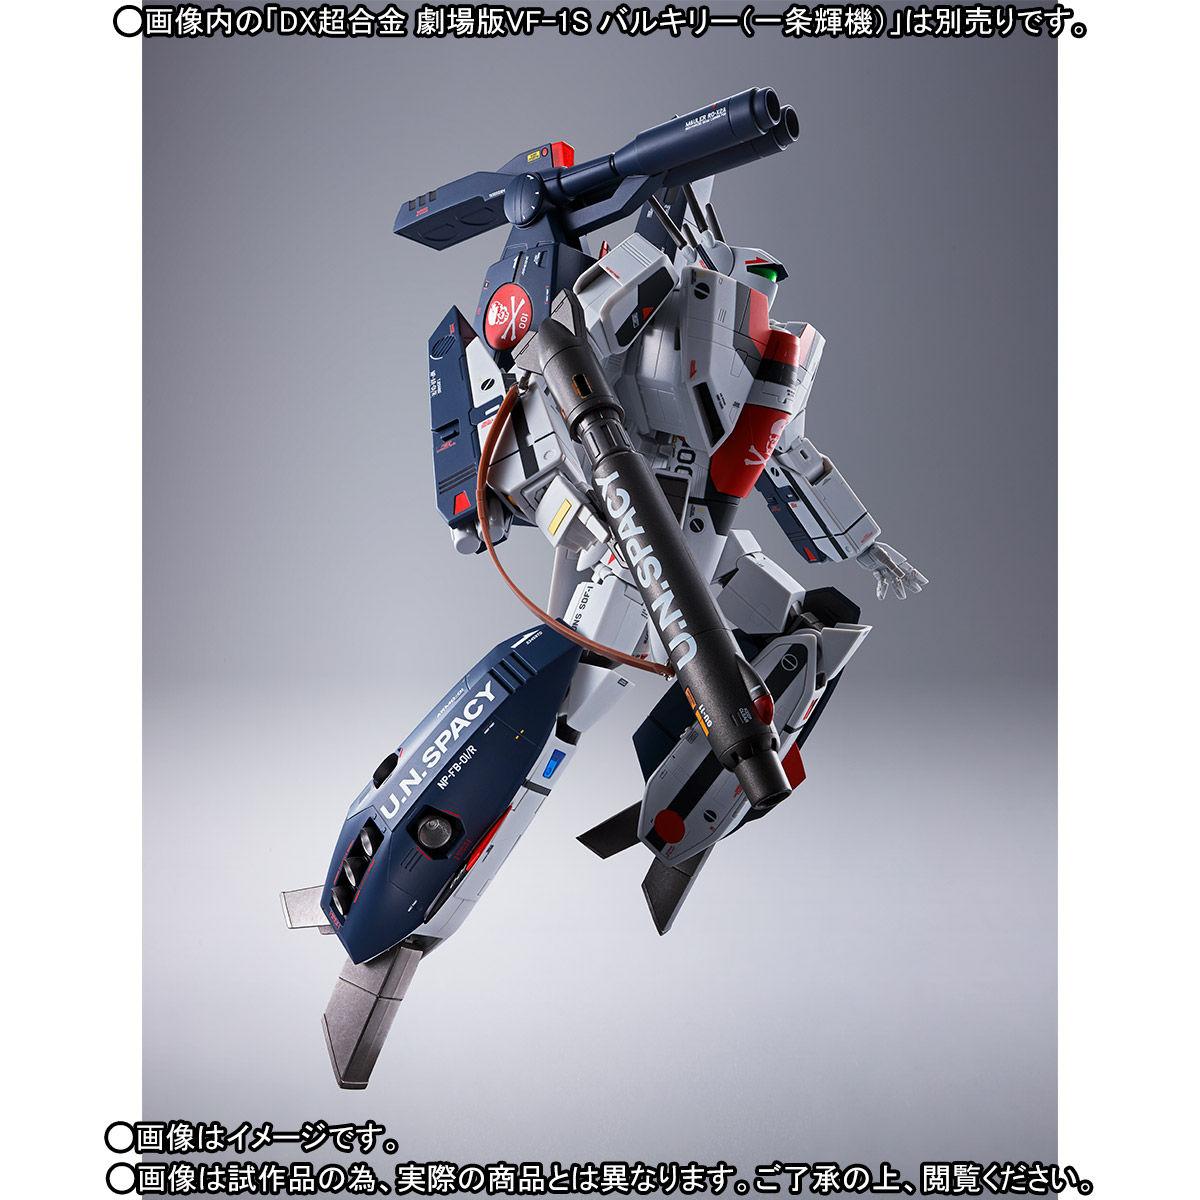 DX超合金『劇場版VF-1対応ストライク/スーパーパーツセット』拡張パーツ-005